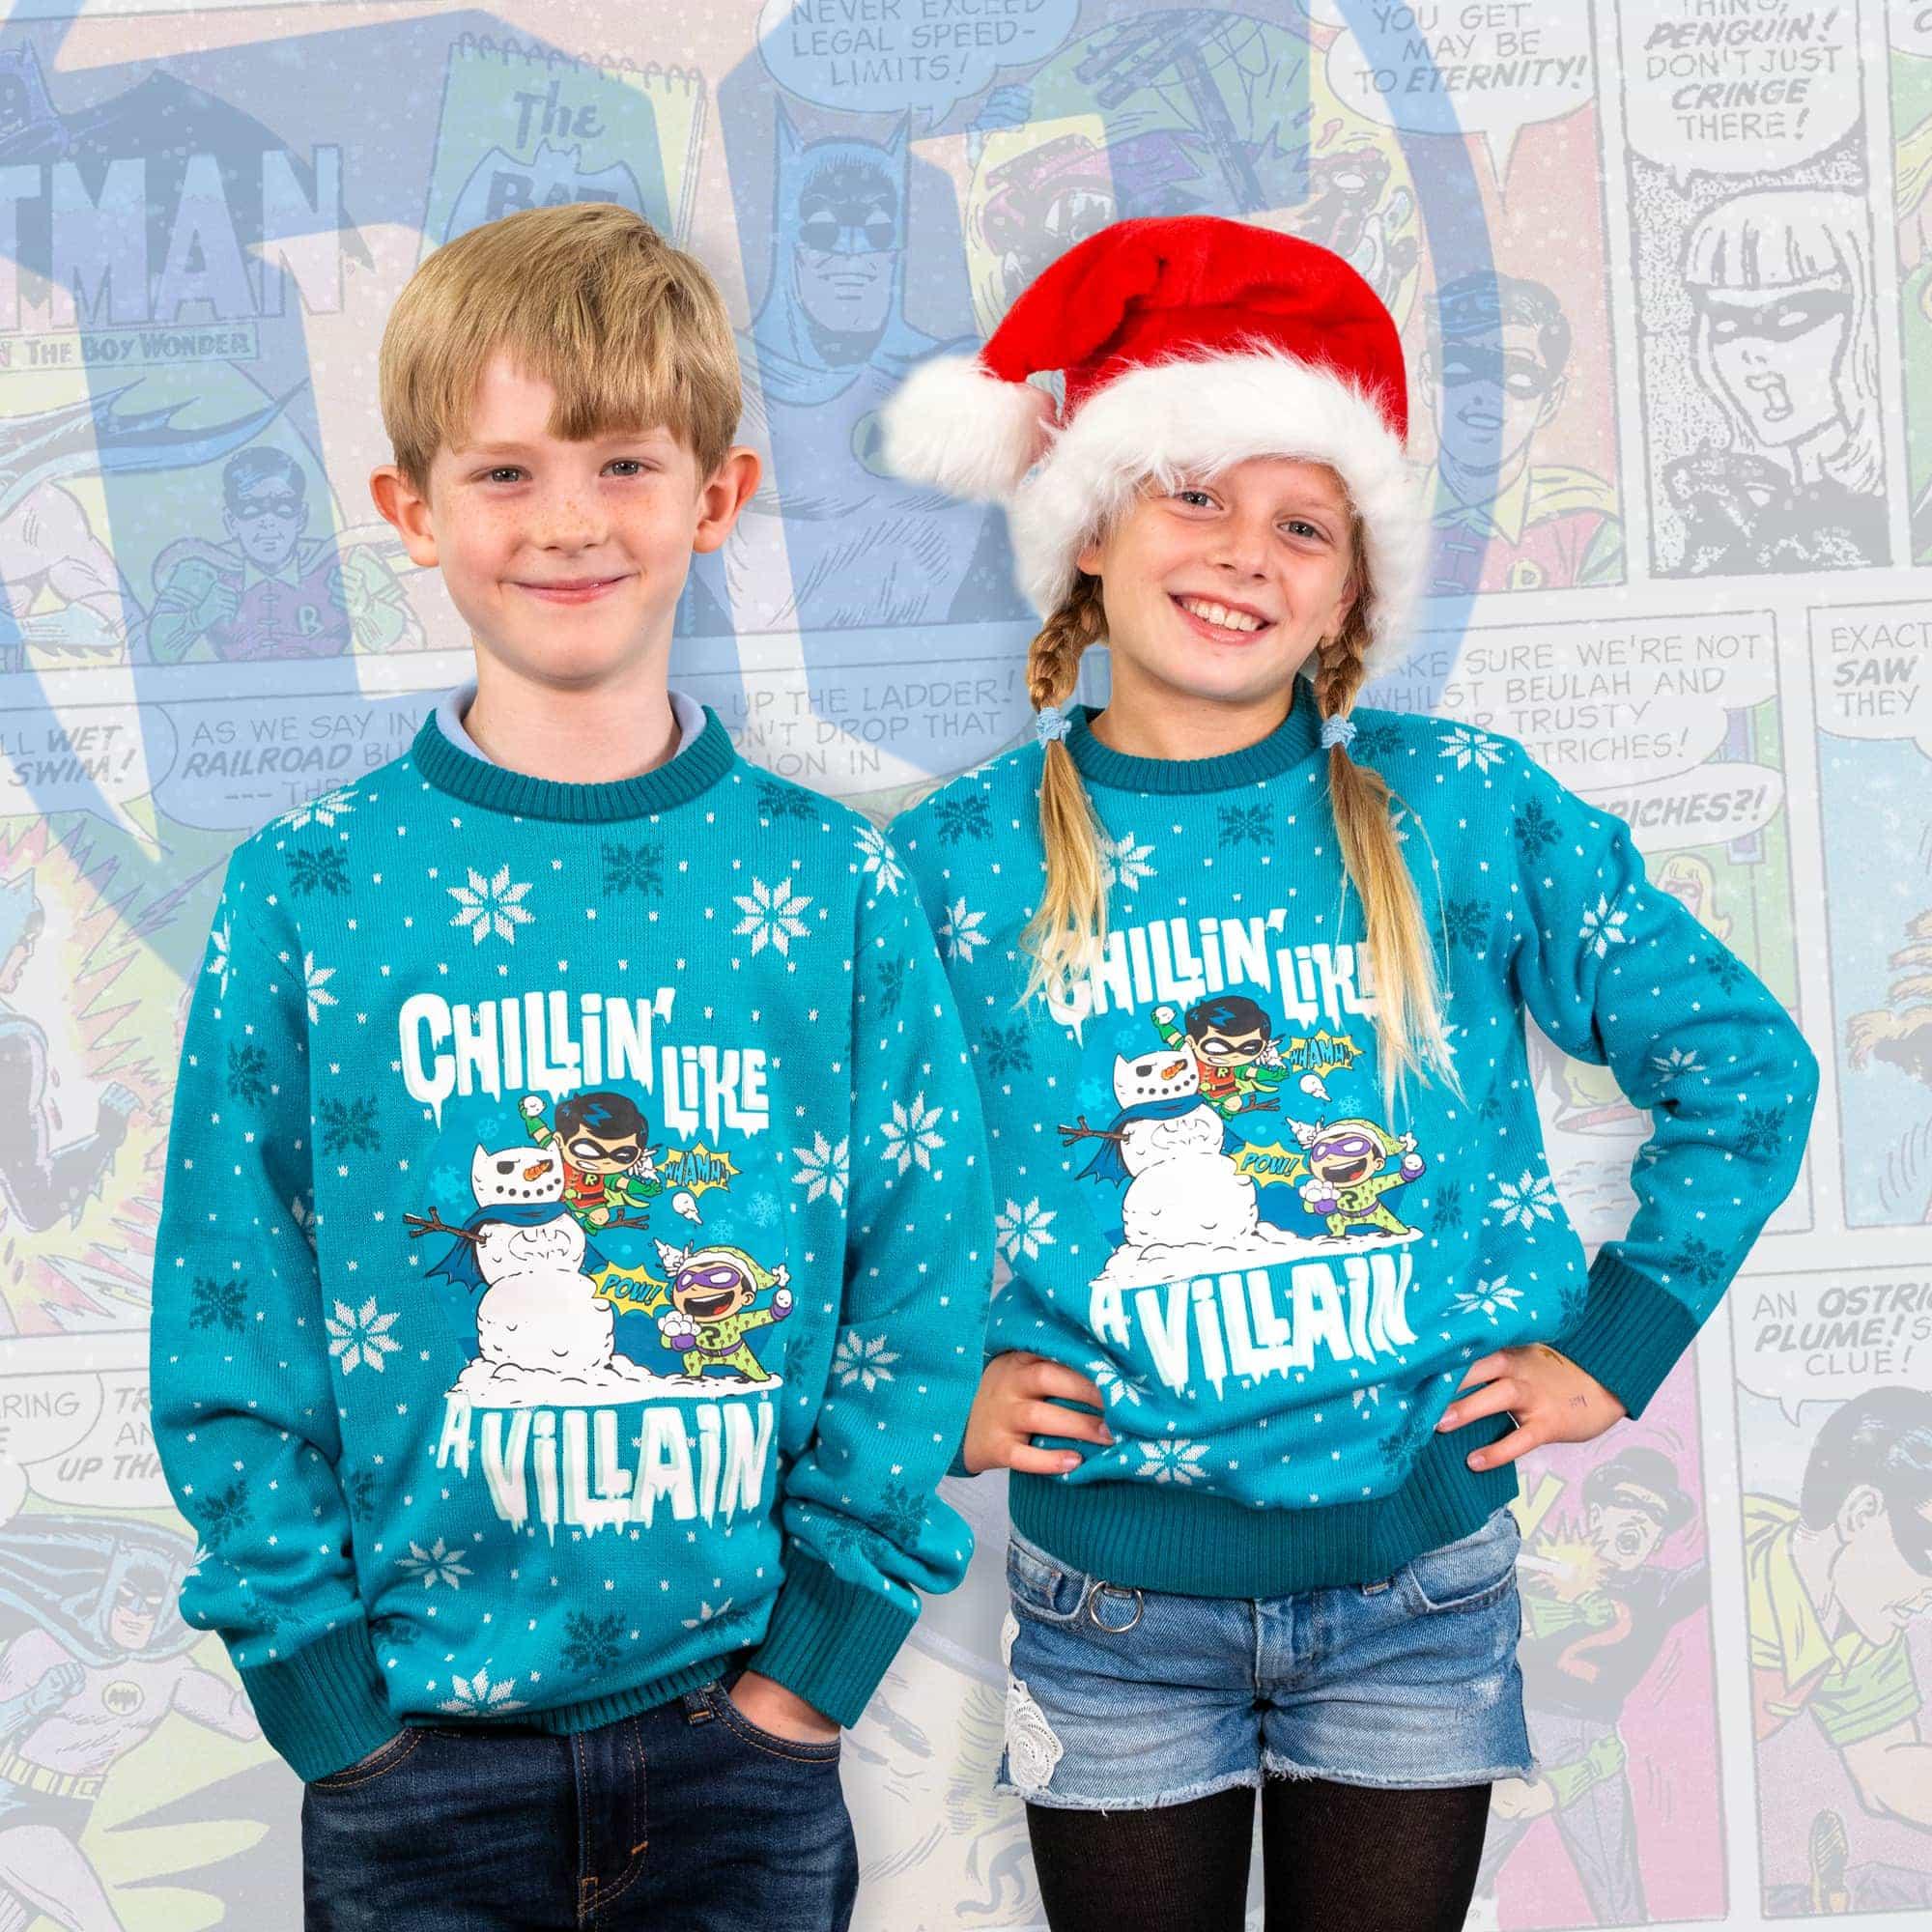 DC 'Chillin like a Villain' Kids Christmas Jumper / Ugly Sweater